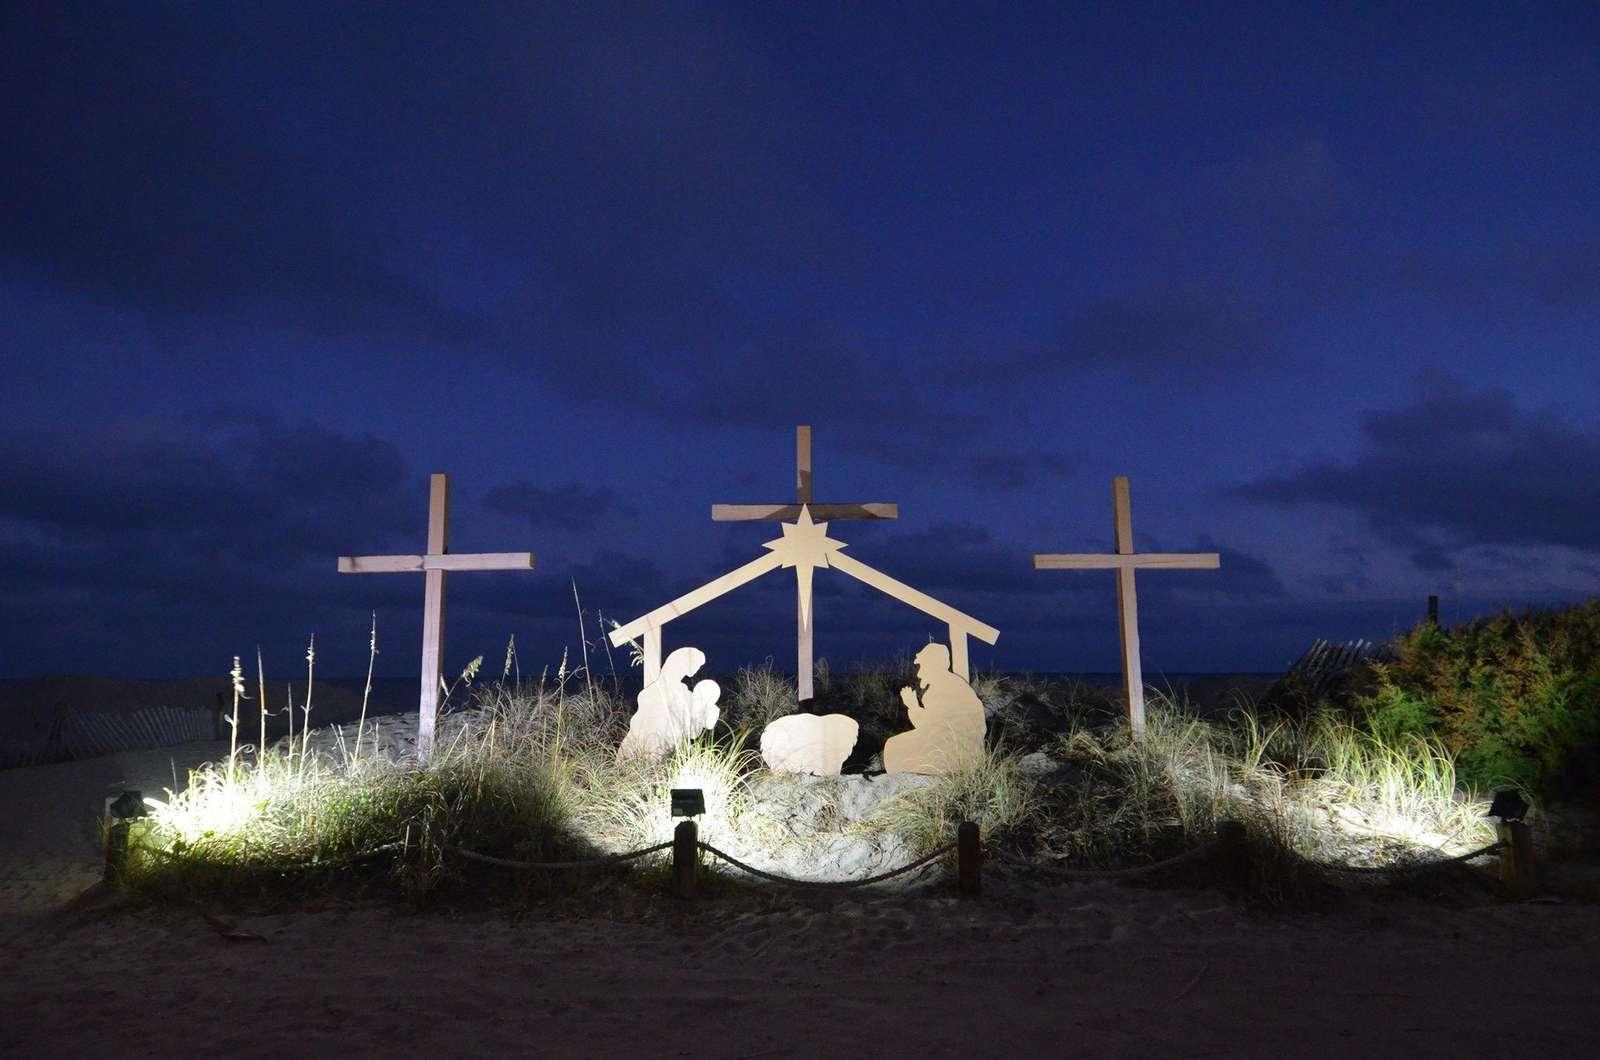 3 Crosses Ocean front at Christmas